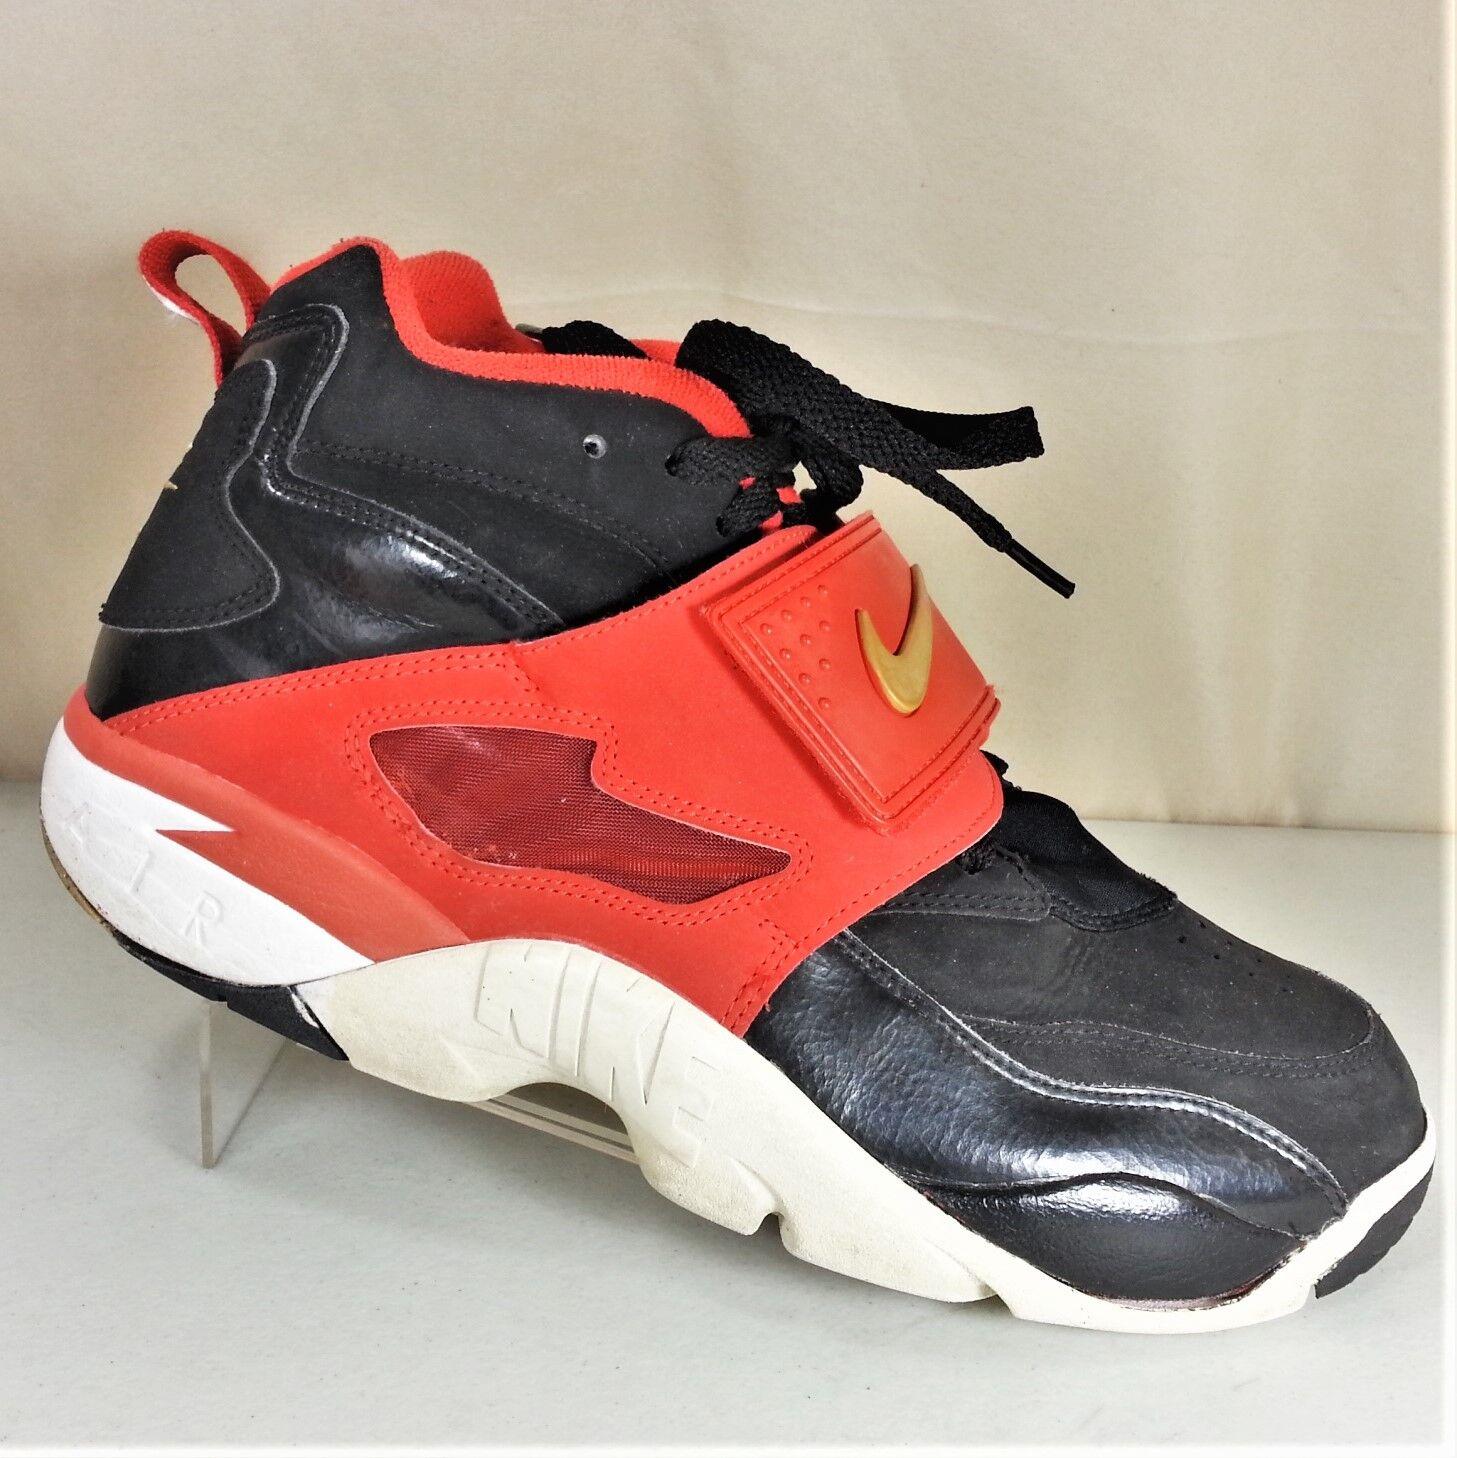 NIKE 309434-009 Air Diamond Turf Deion Sanders Mens Athletic shoes Size 9.5